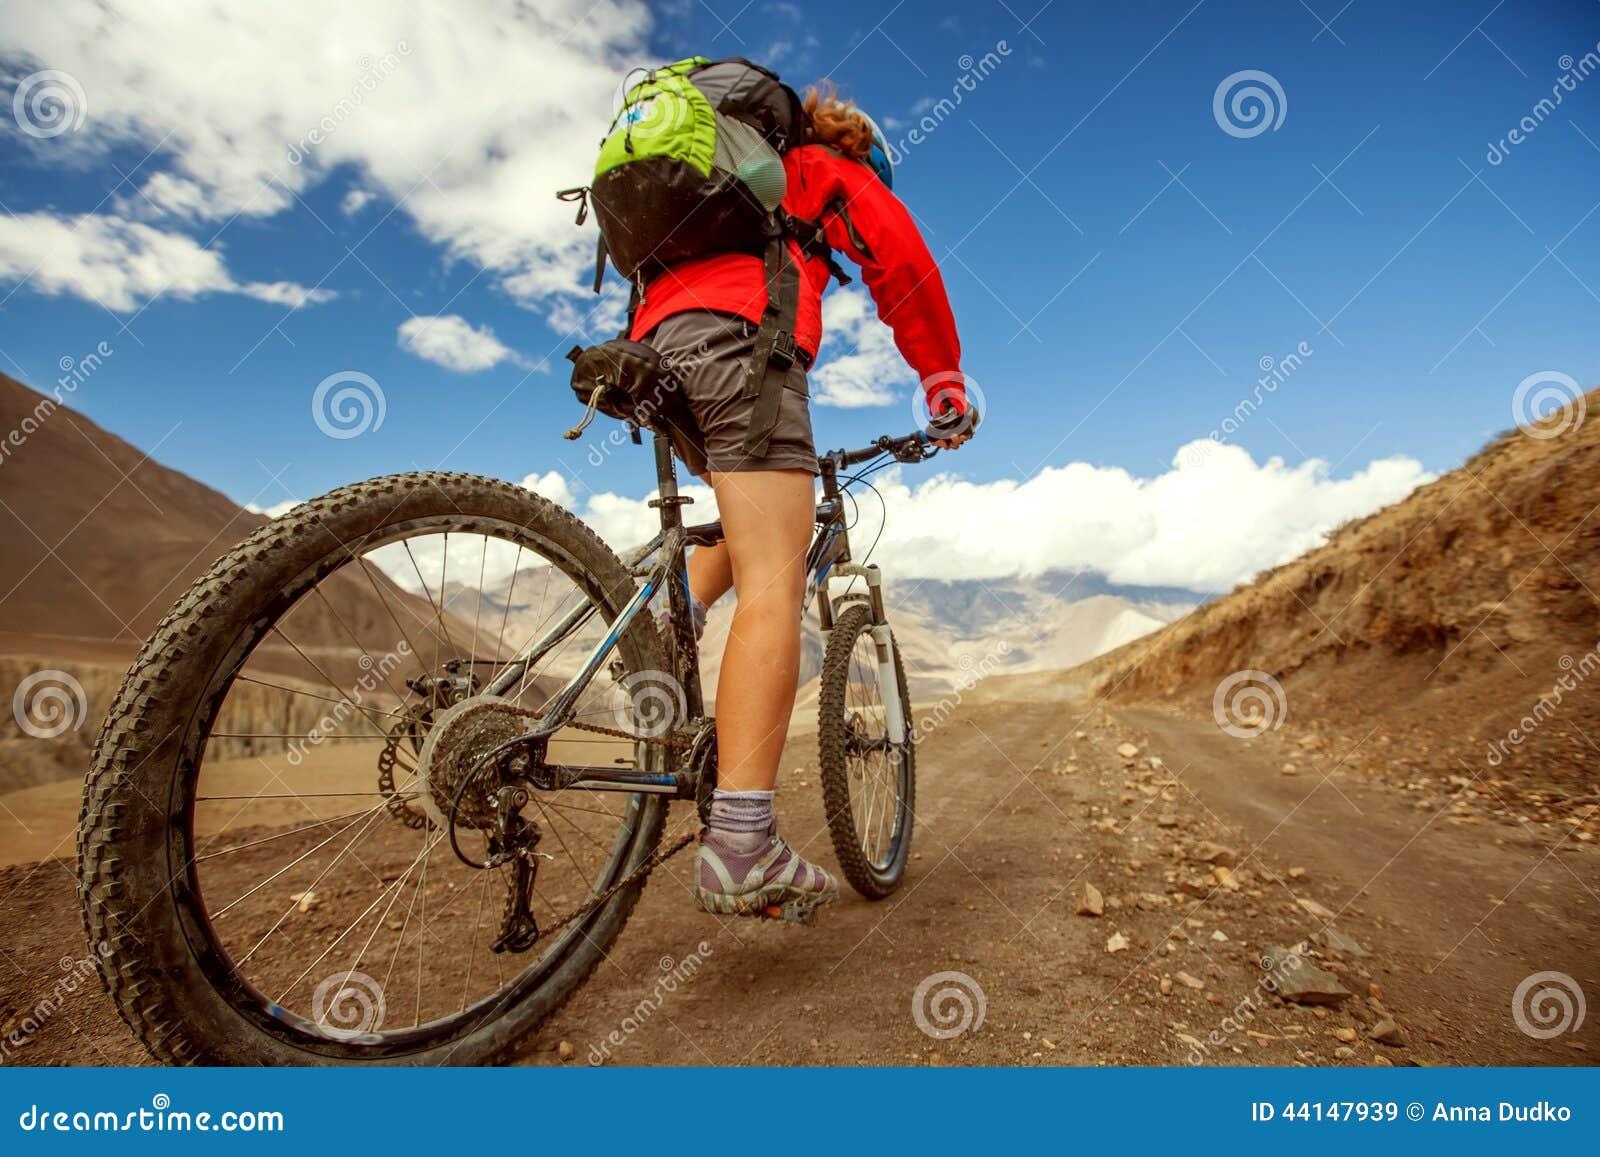 Girl cycling at the road